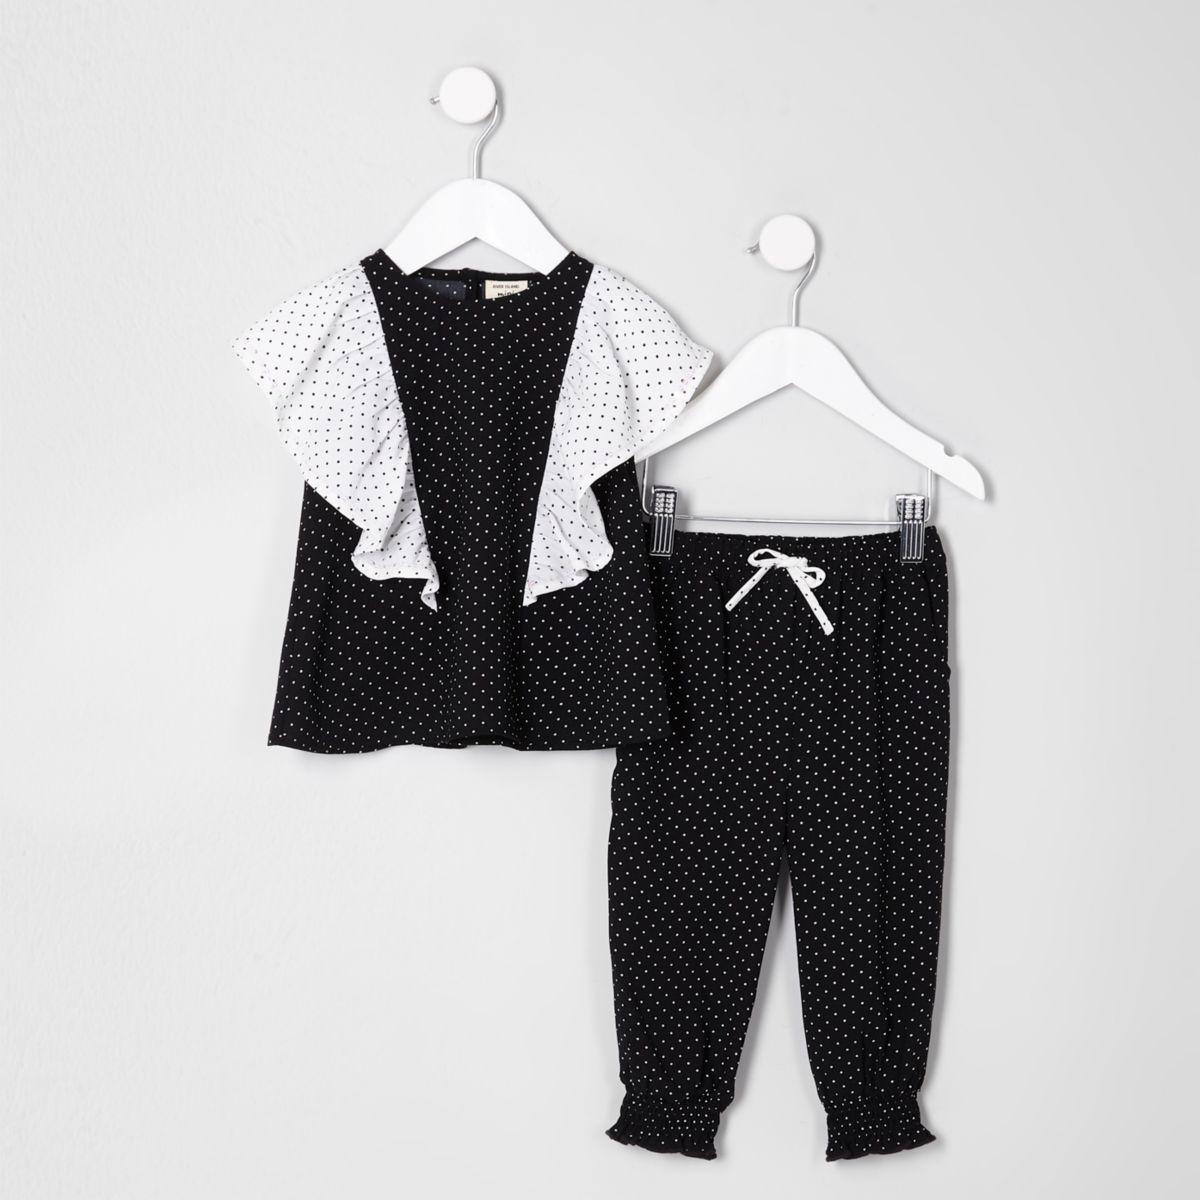 Mini girls black polka dot frill top outfit